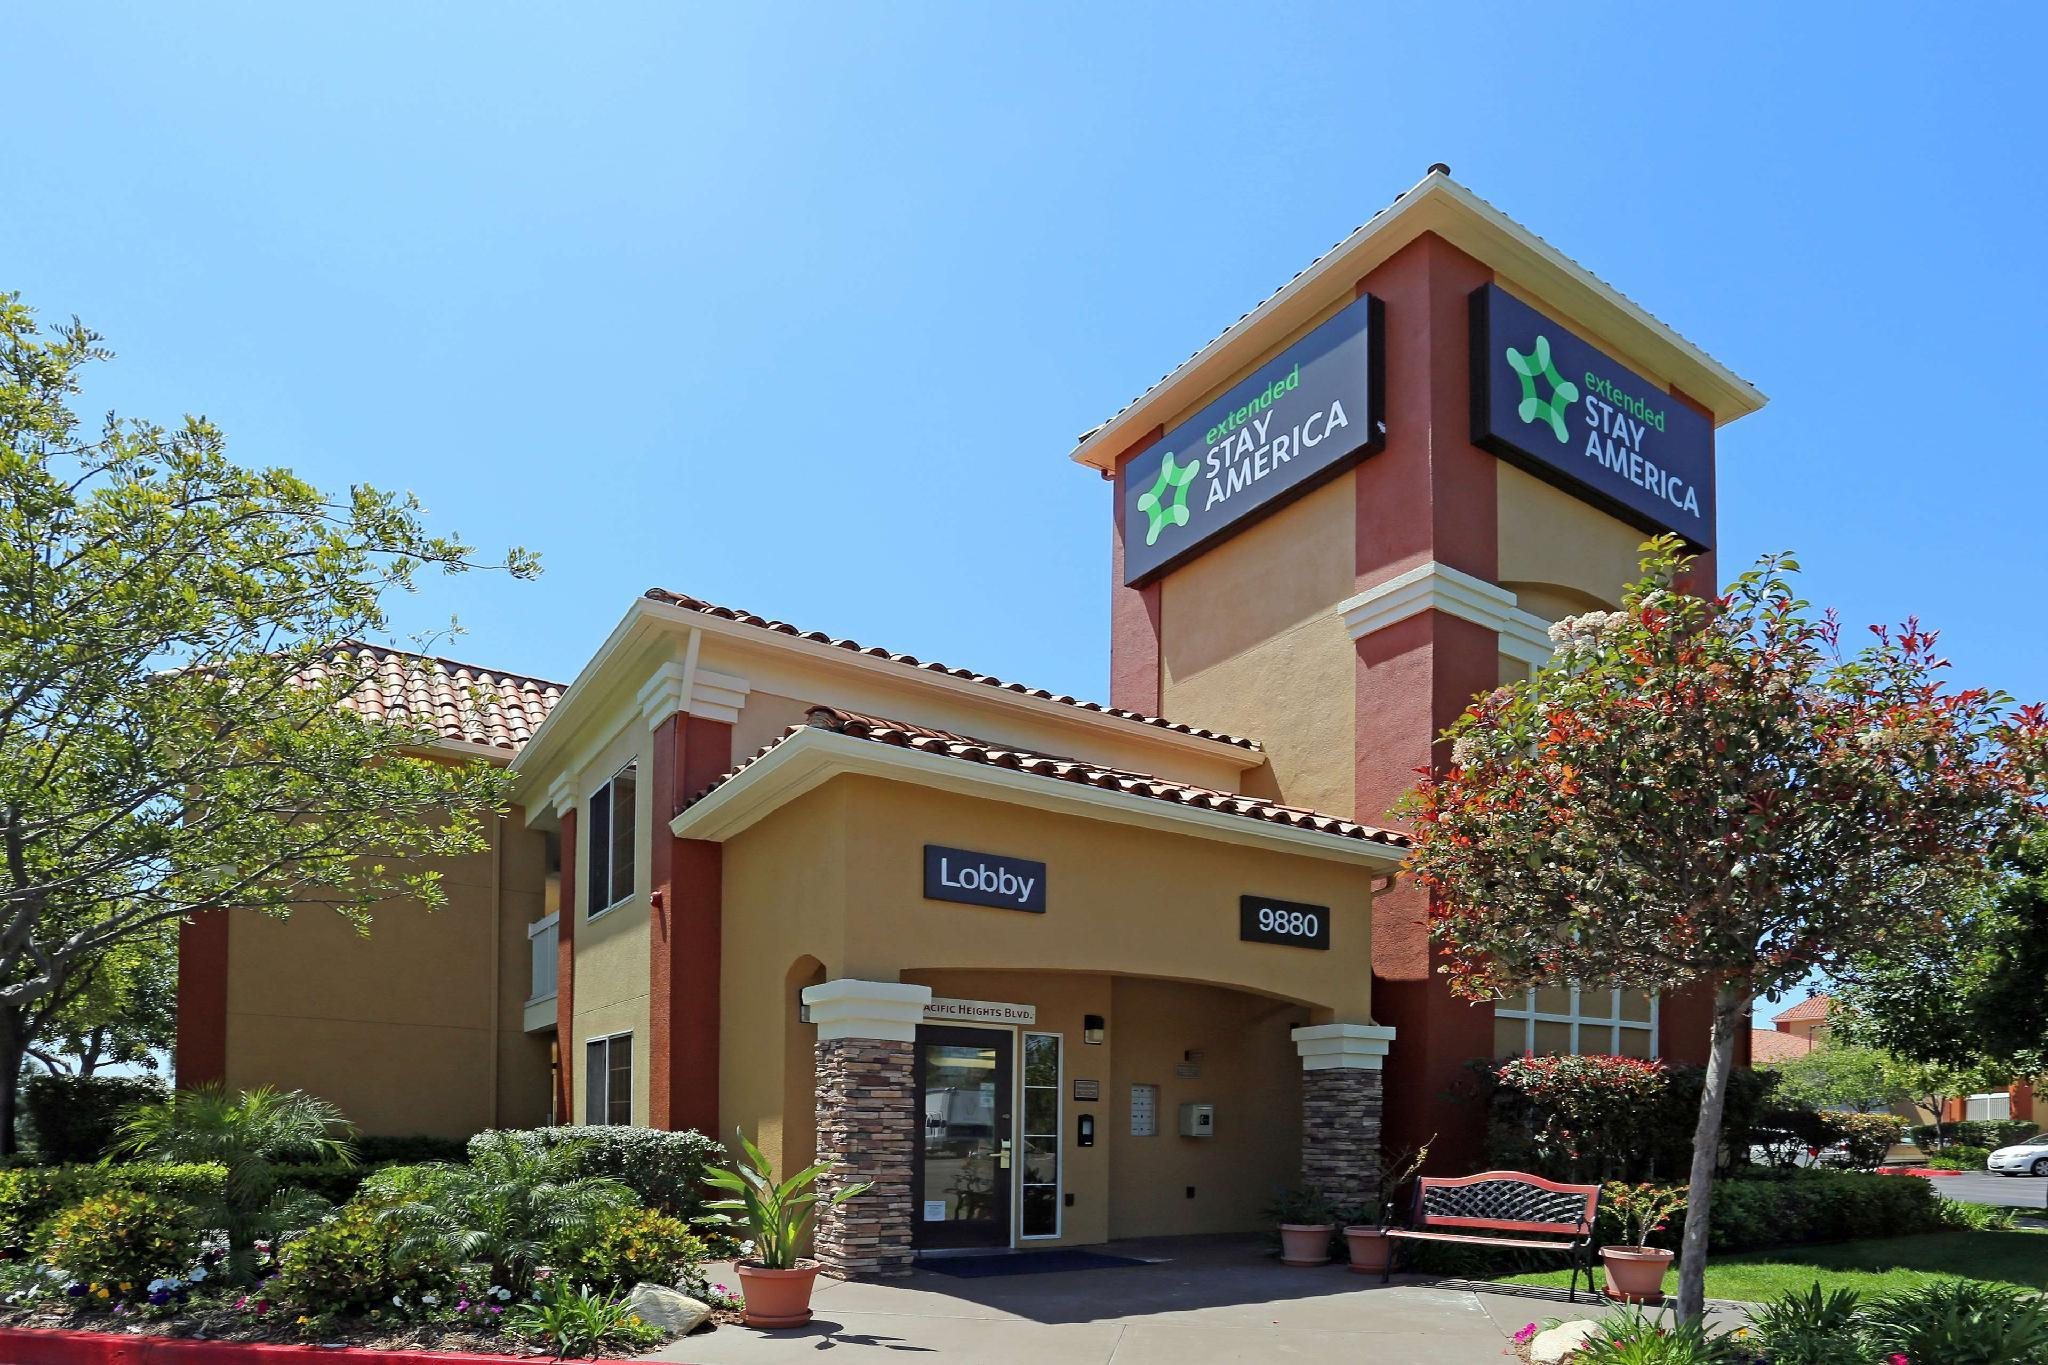 Extended Stay America - San Diego - Sorrento Mesa